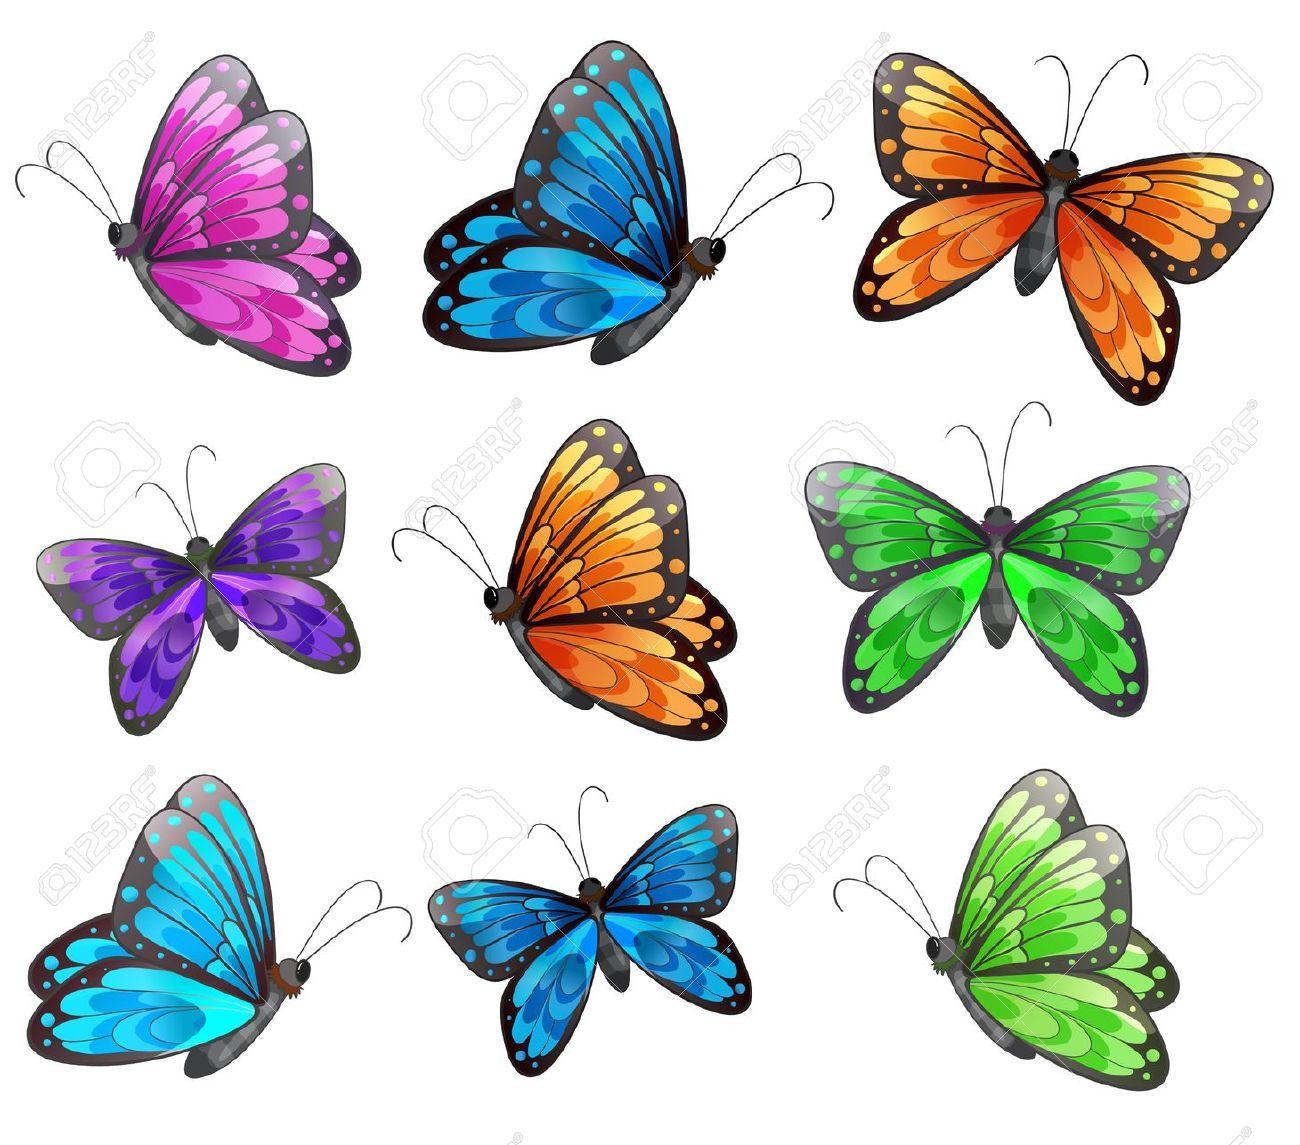 Papillon dessin recherche google dessin insectes - Papillon imprimer ...